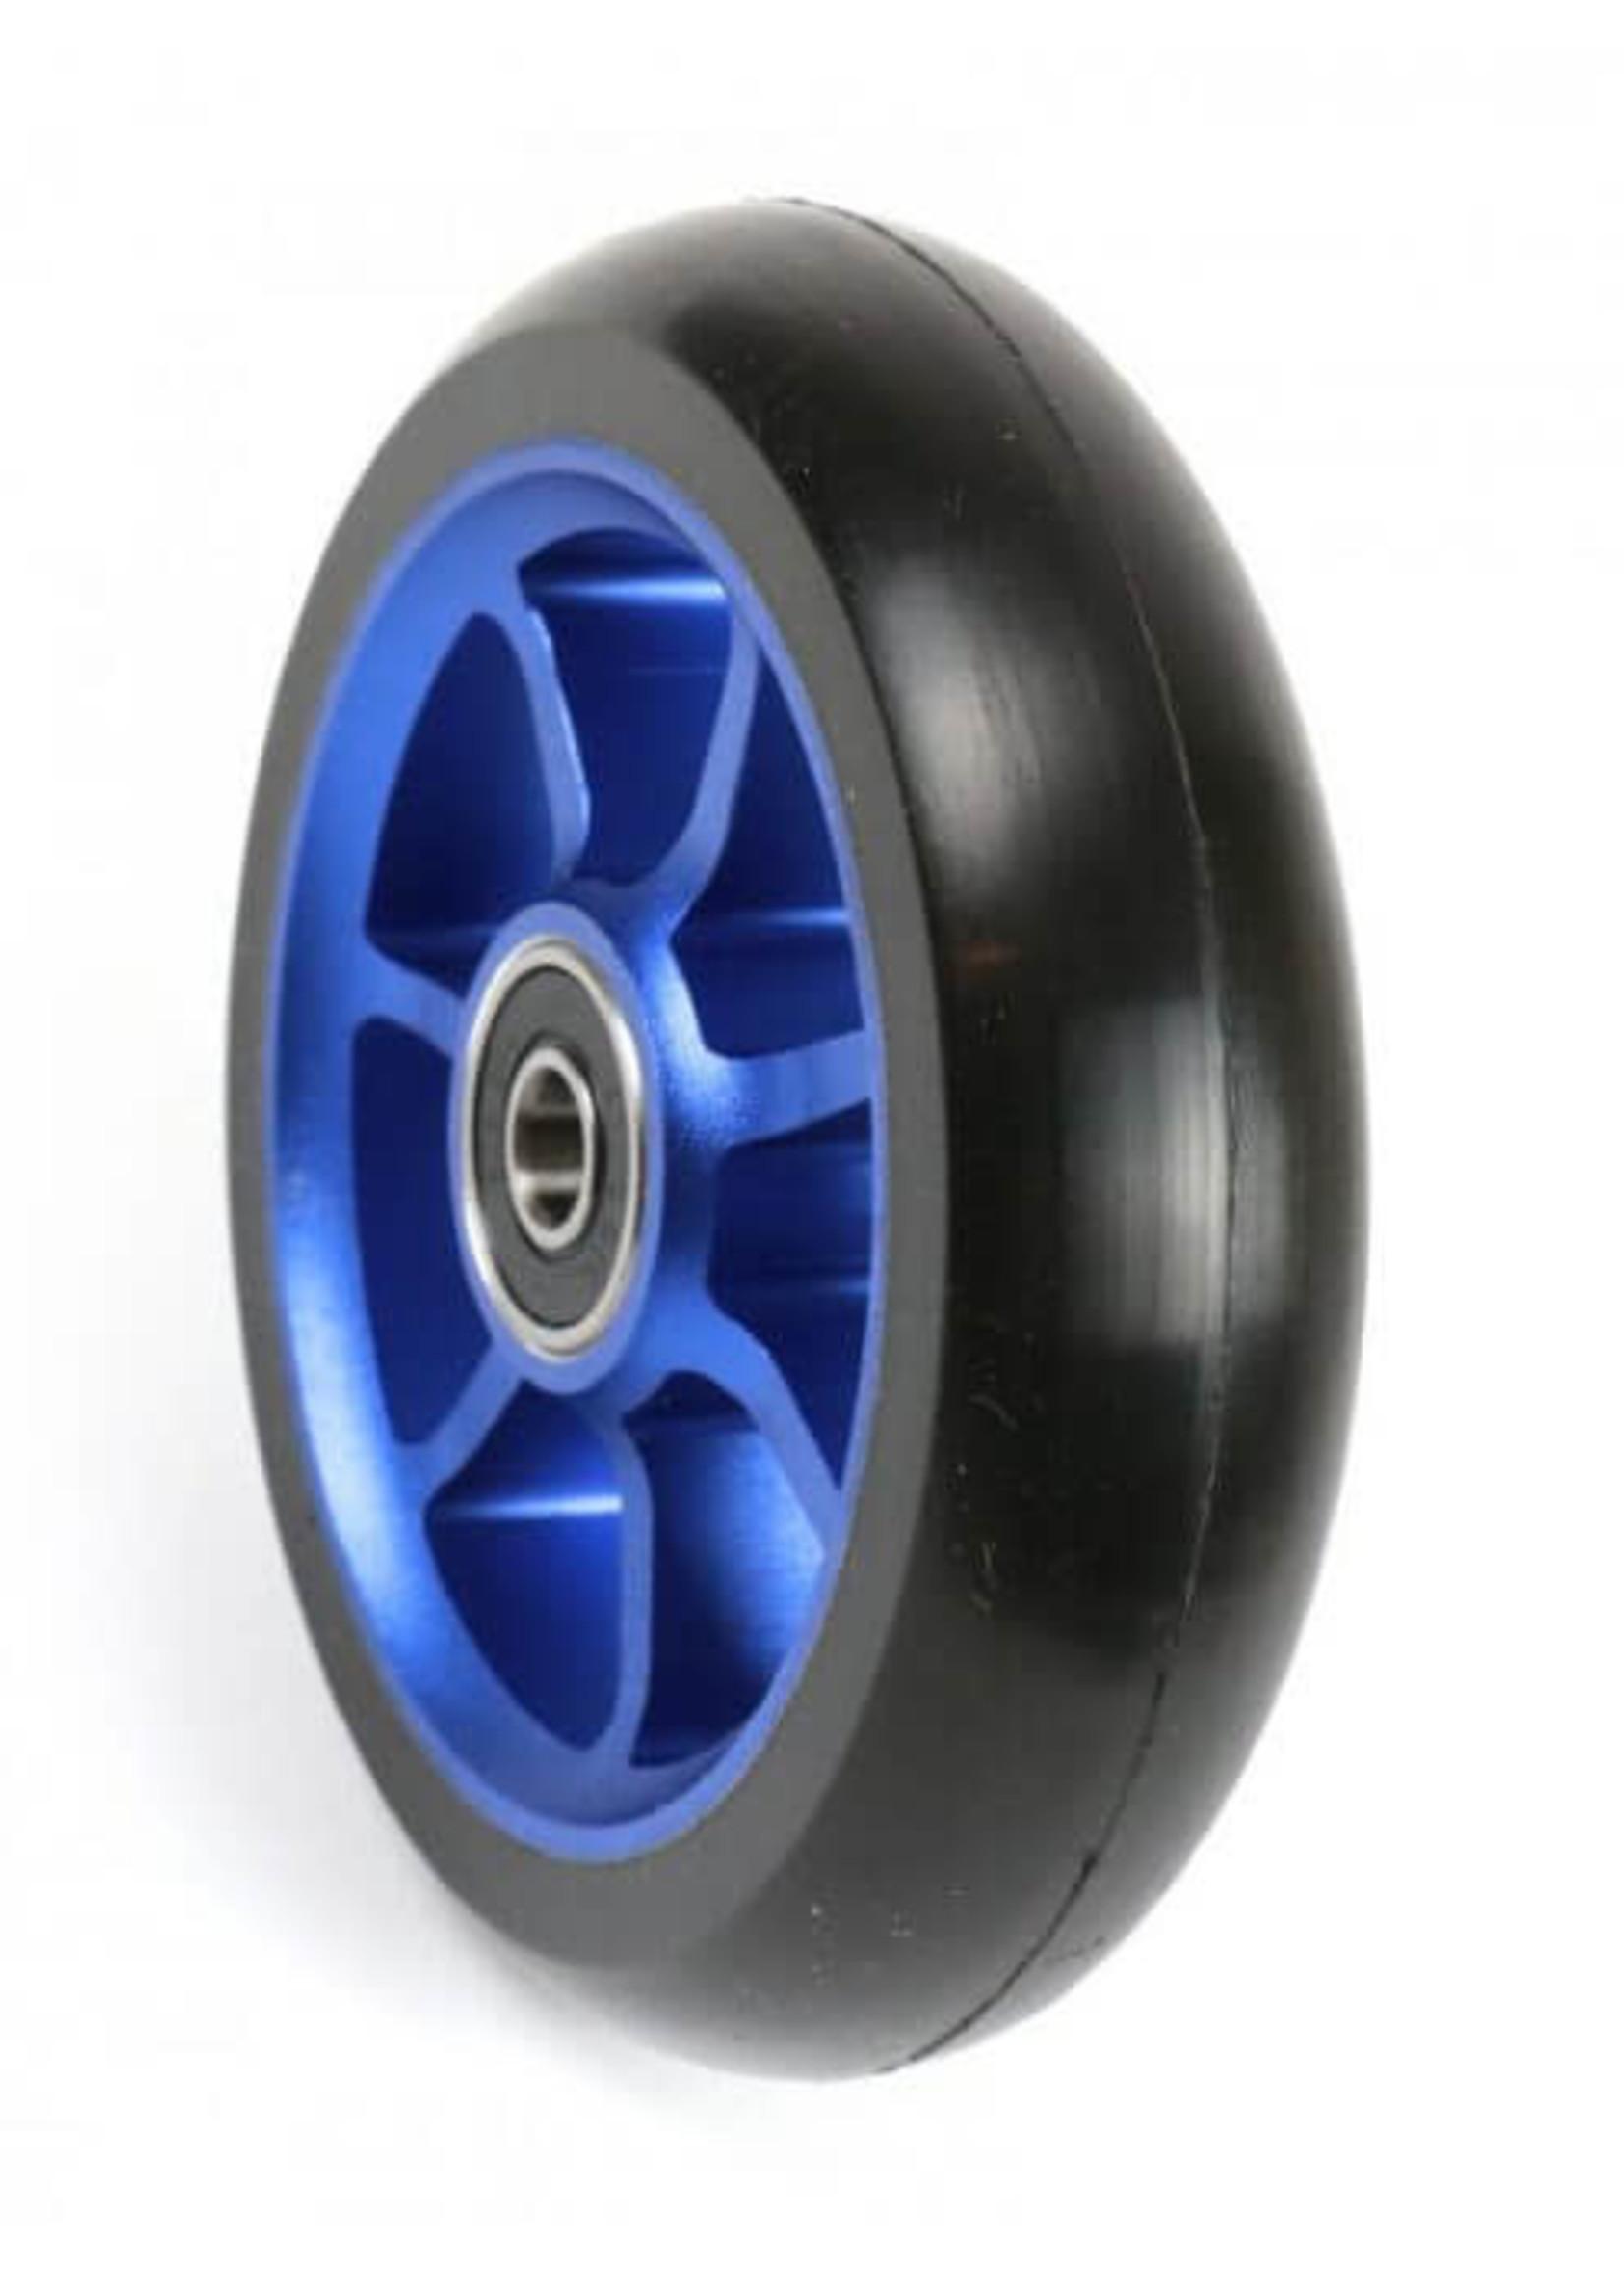 Ethic Ethic - Incube Wheel - 100mm